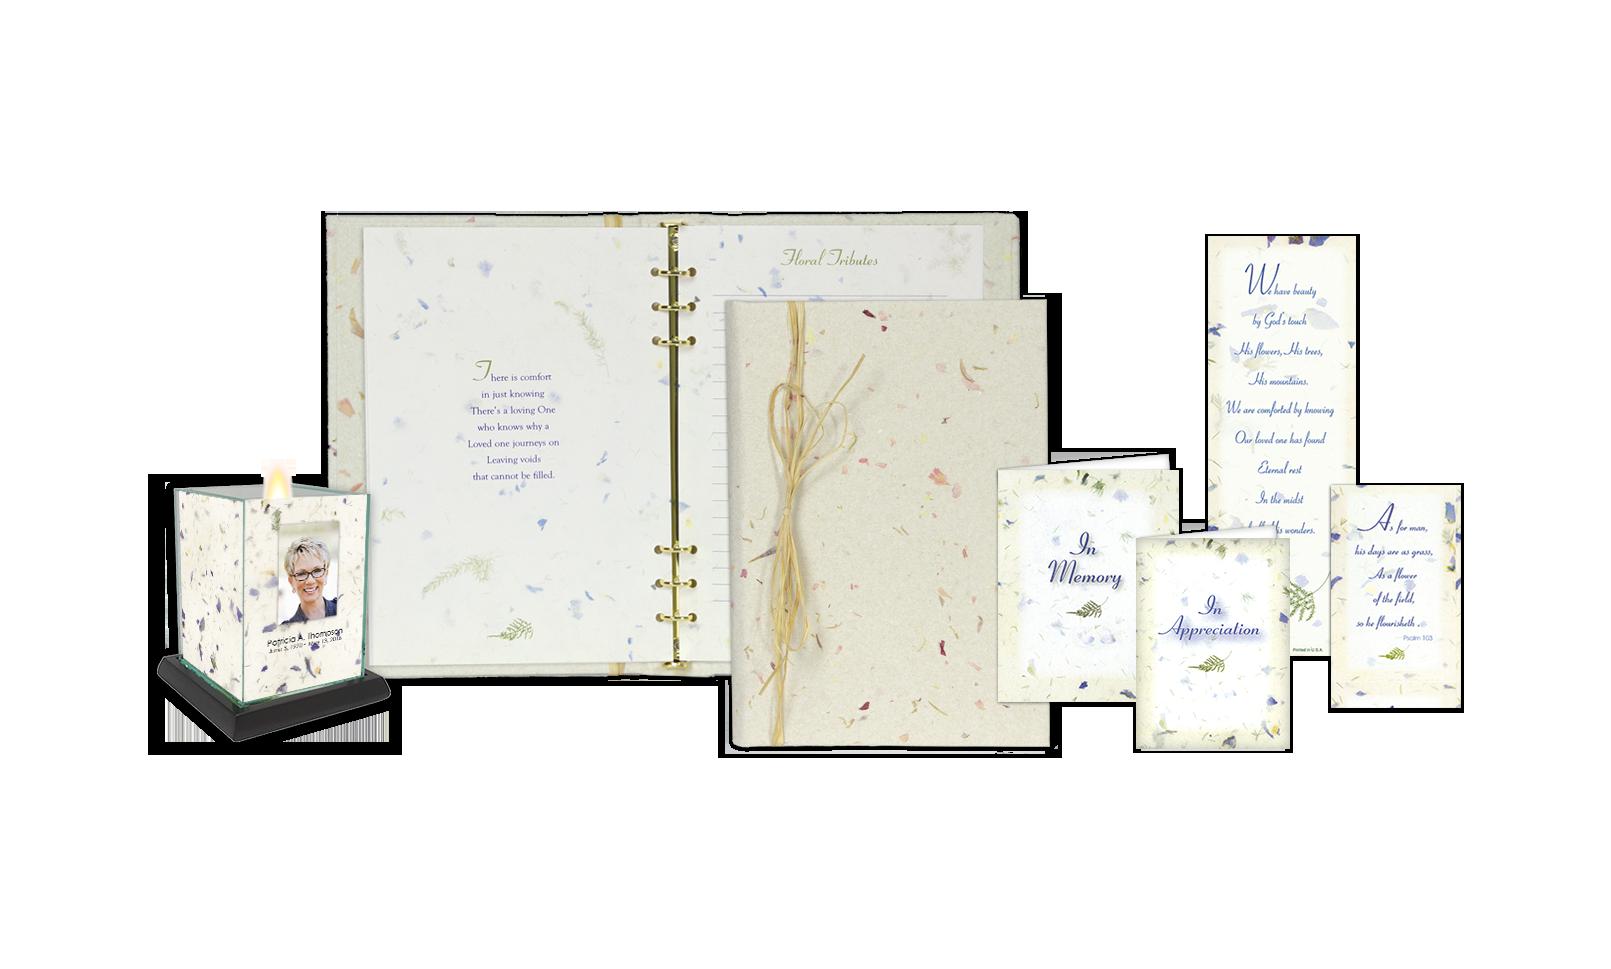 ROL Handmade Natural Floral Paper Series 317 HM